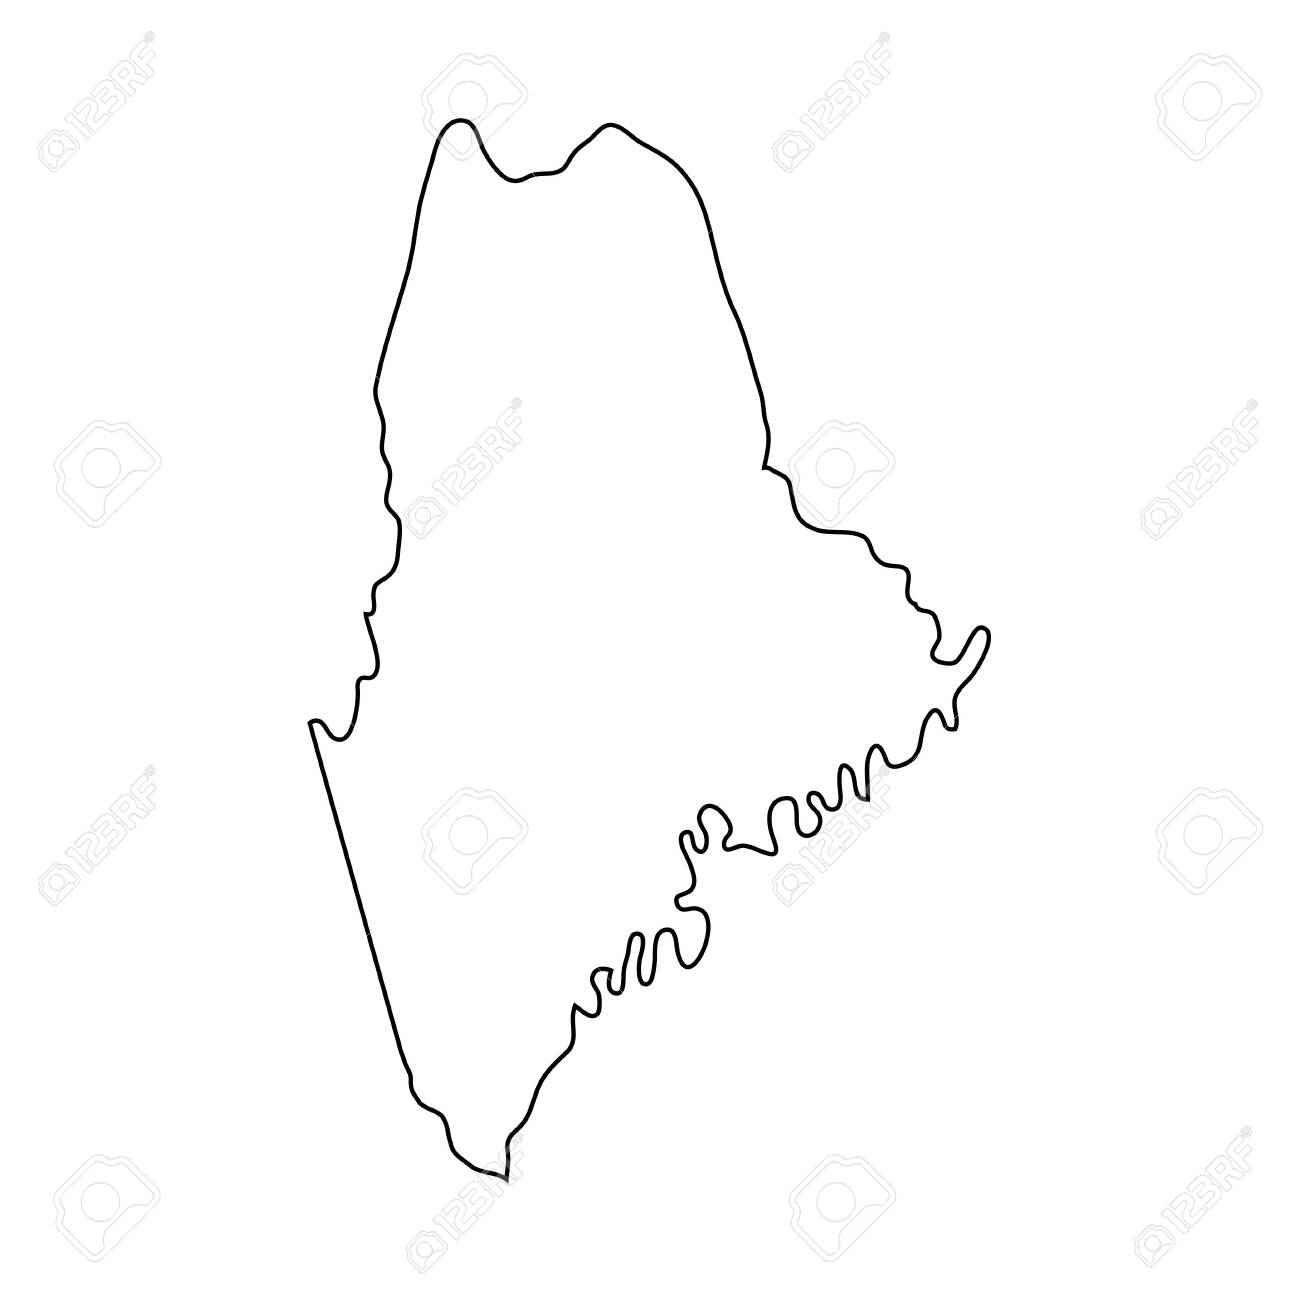 Maine - U.S. state. Contour line in black color. - 134074597